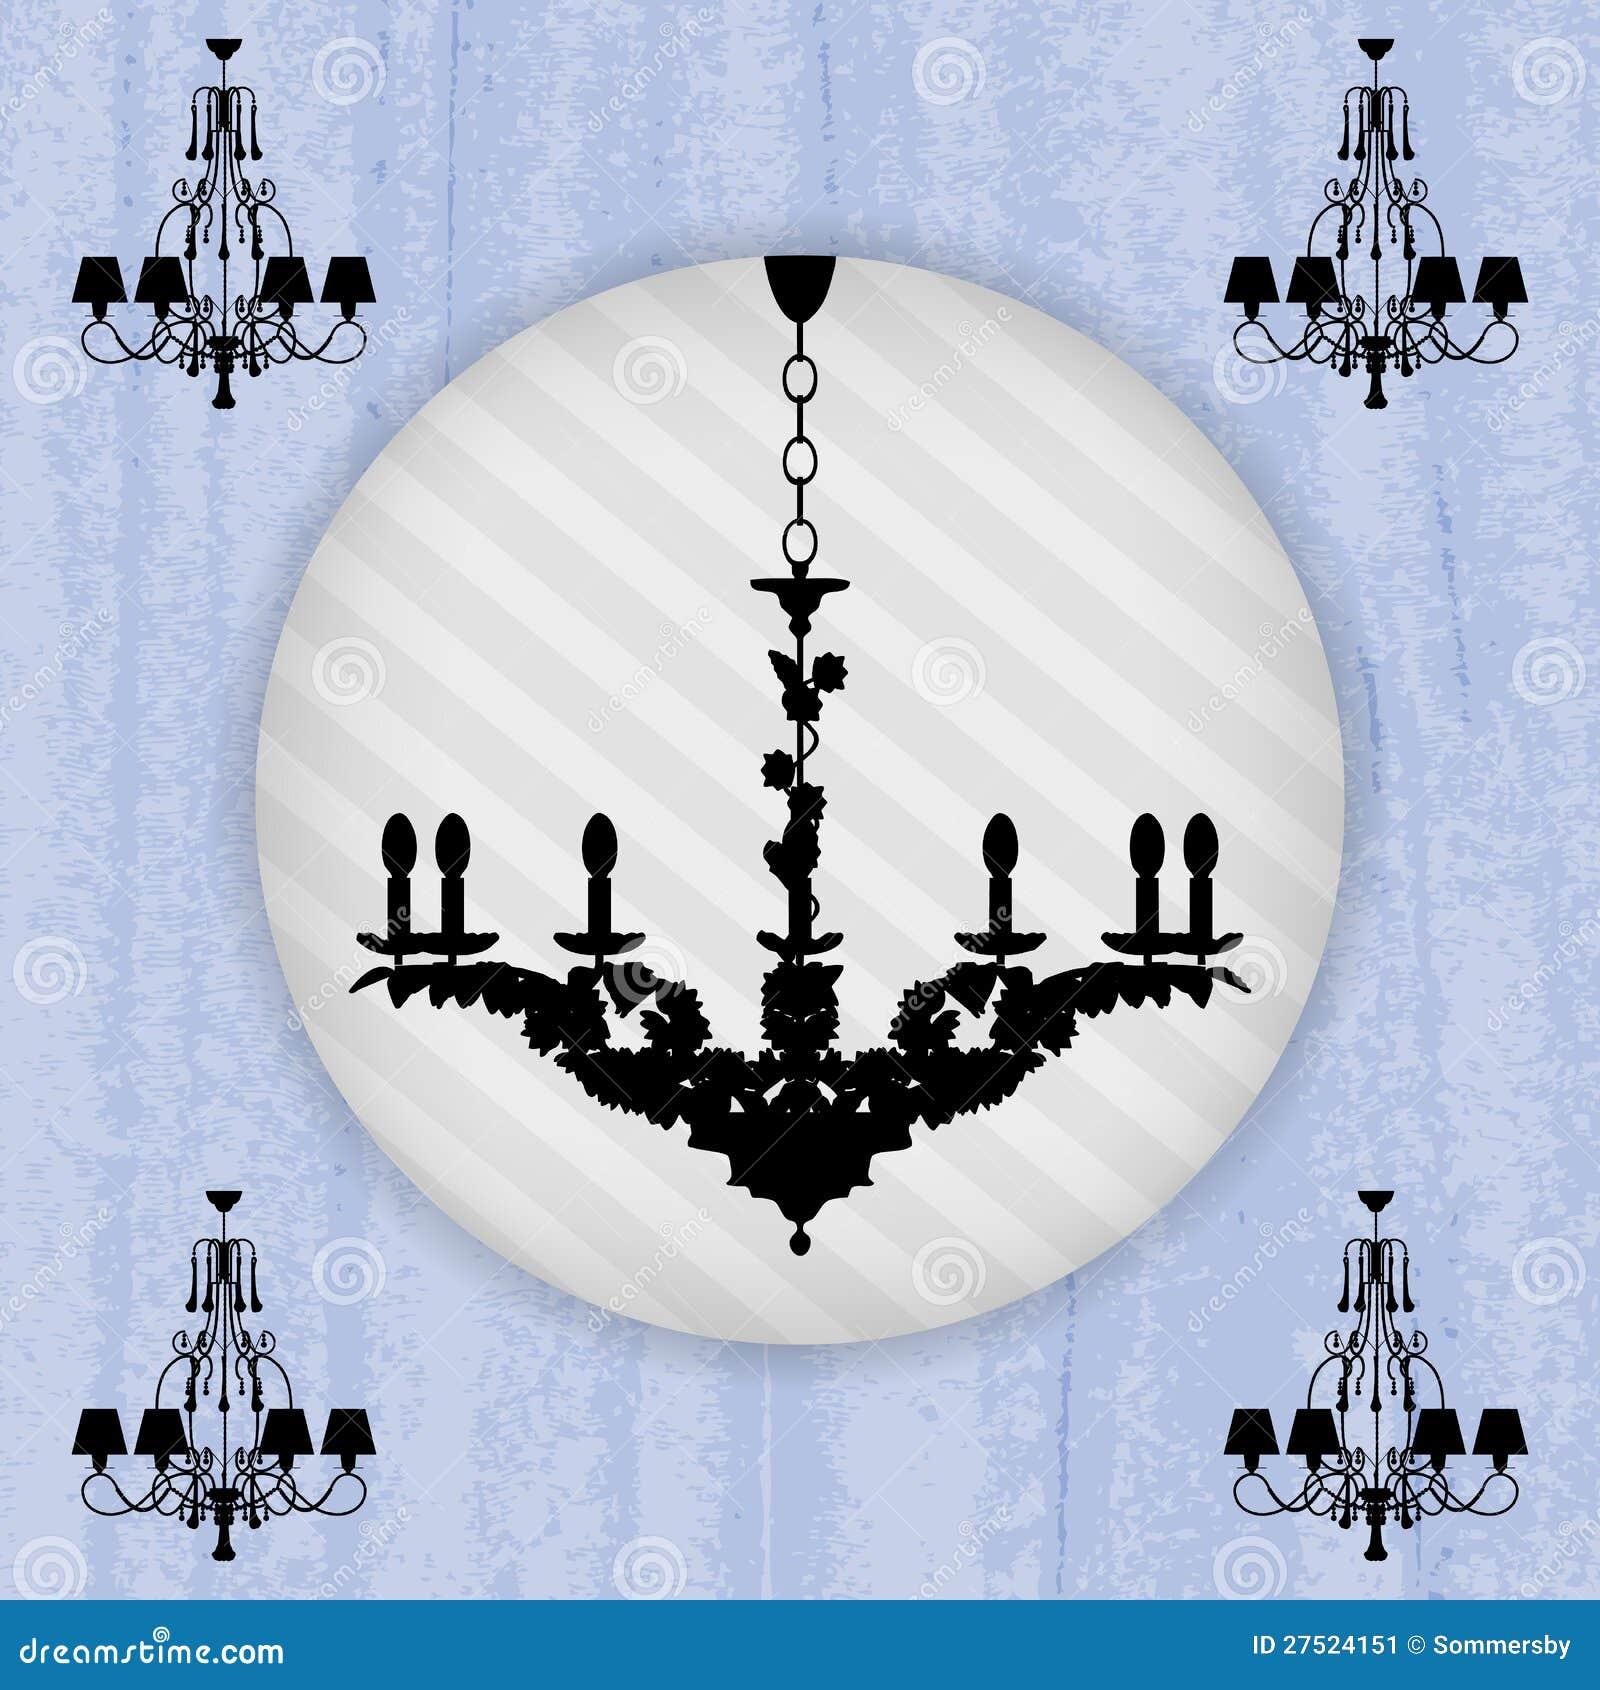 blue chandelier wallpaper - photo #5